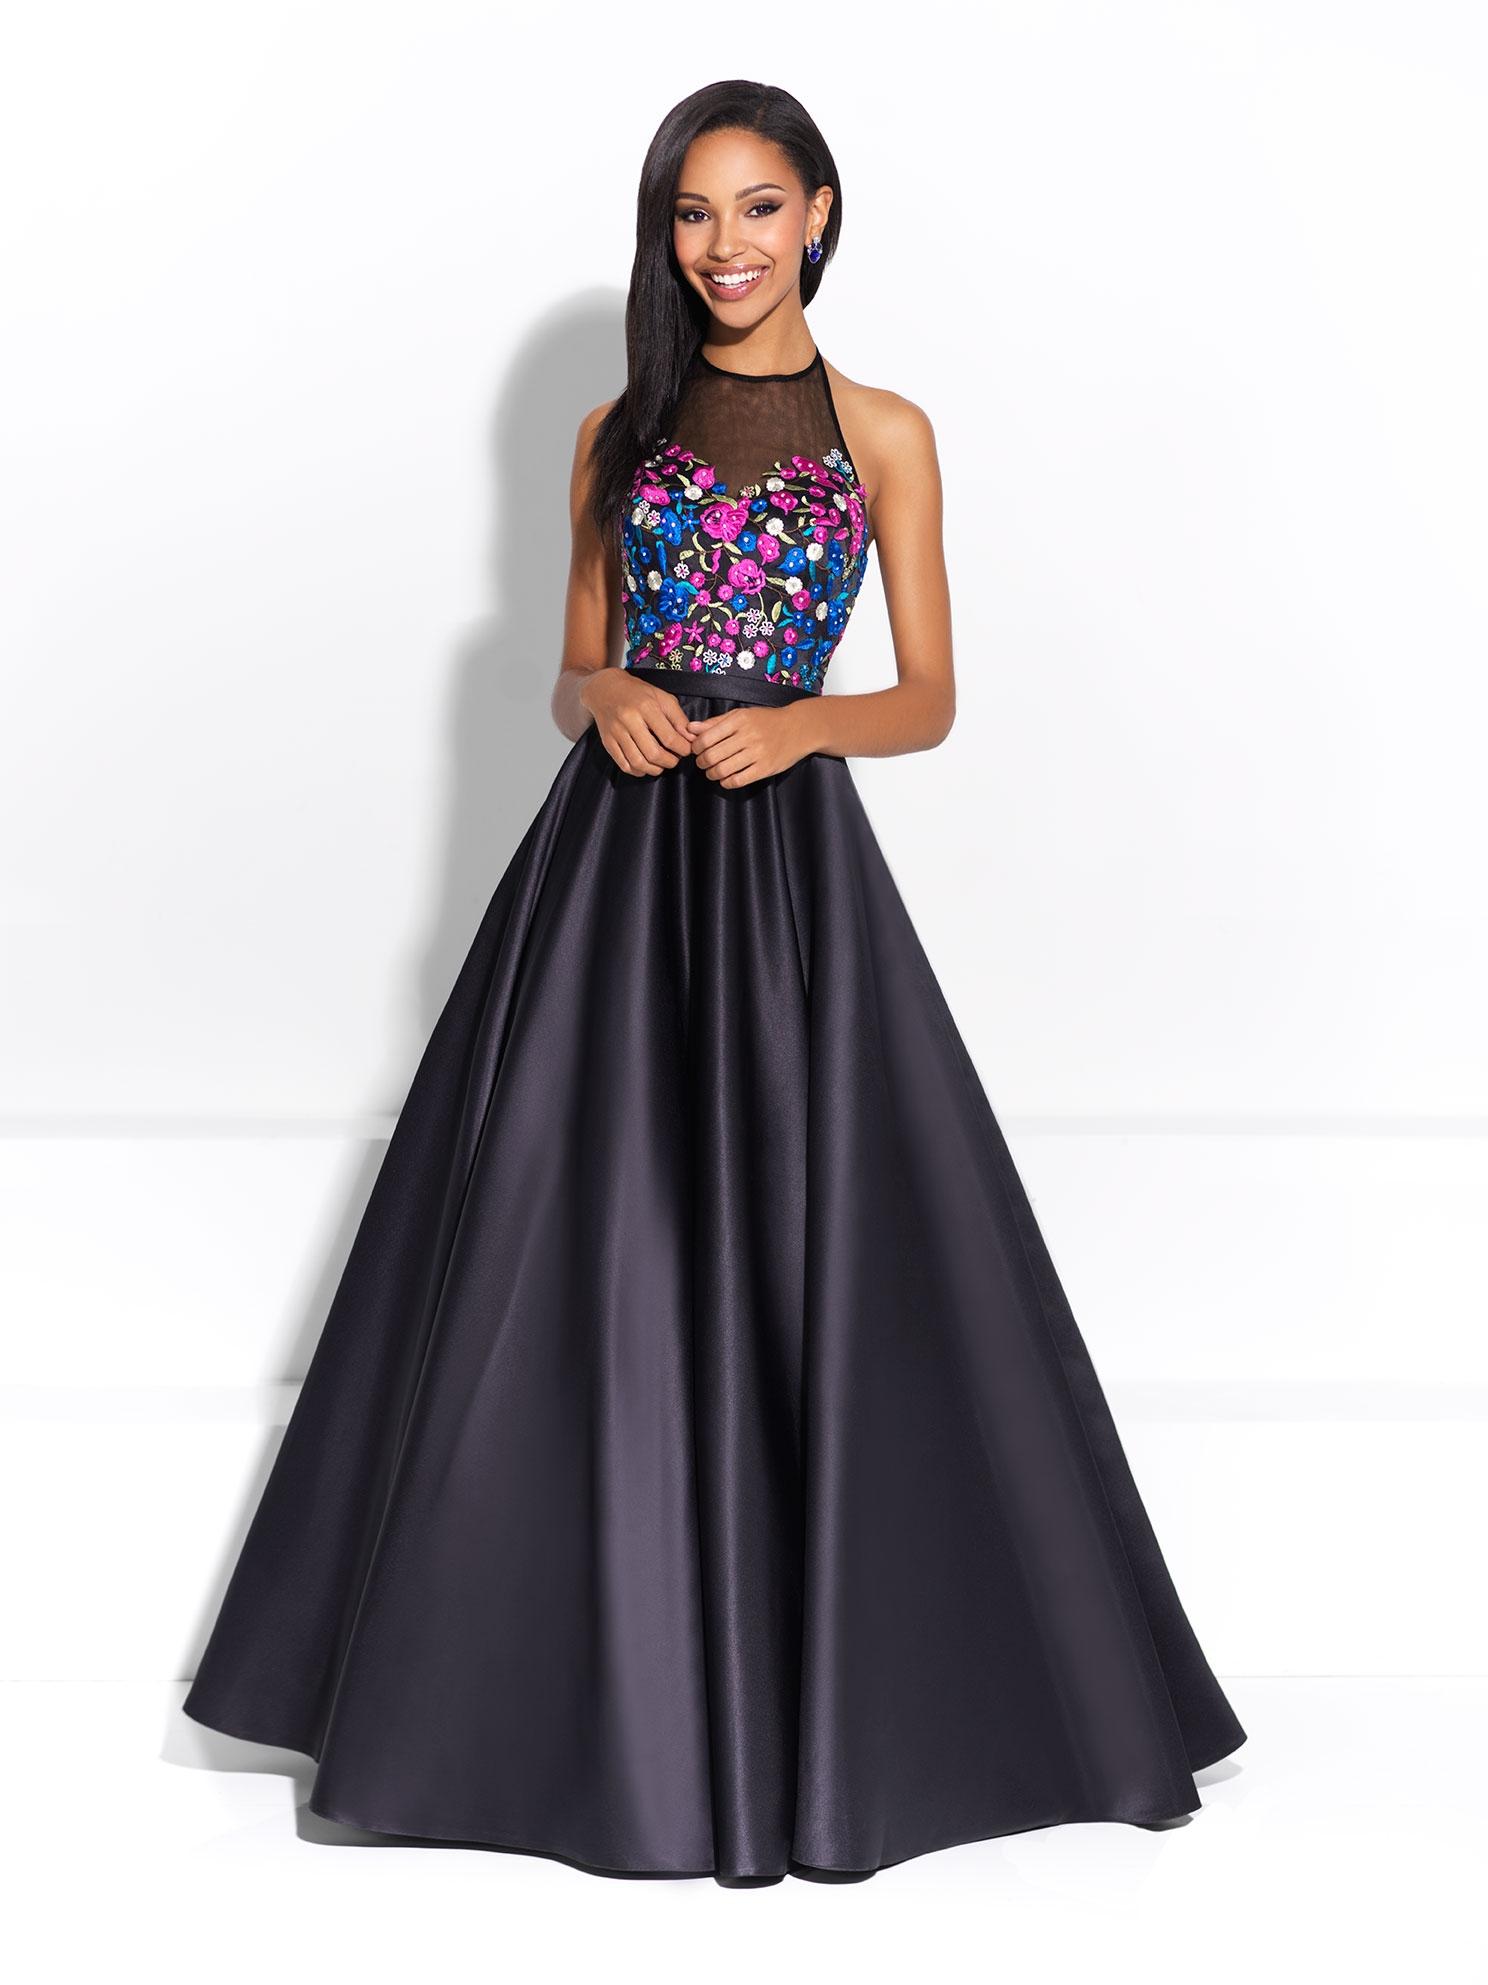 b21e452236d2 Spoločenské šaty   MJ 17-294